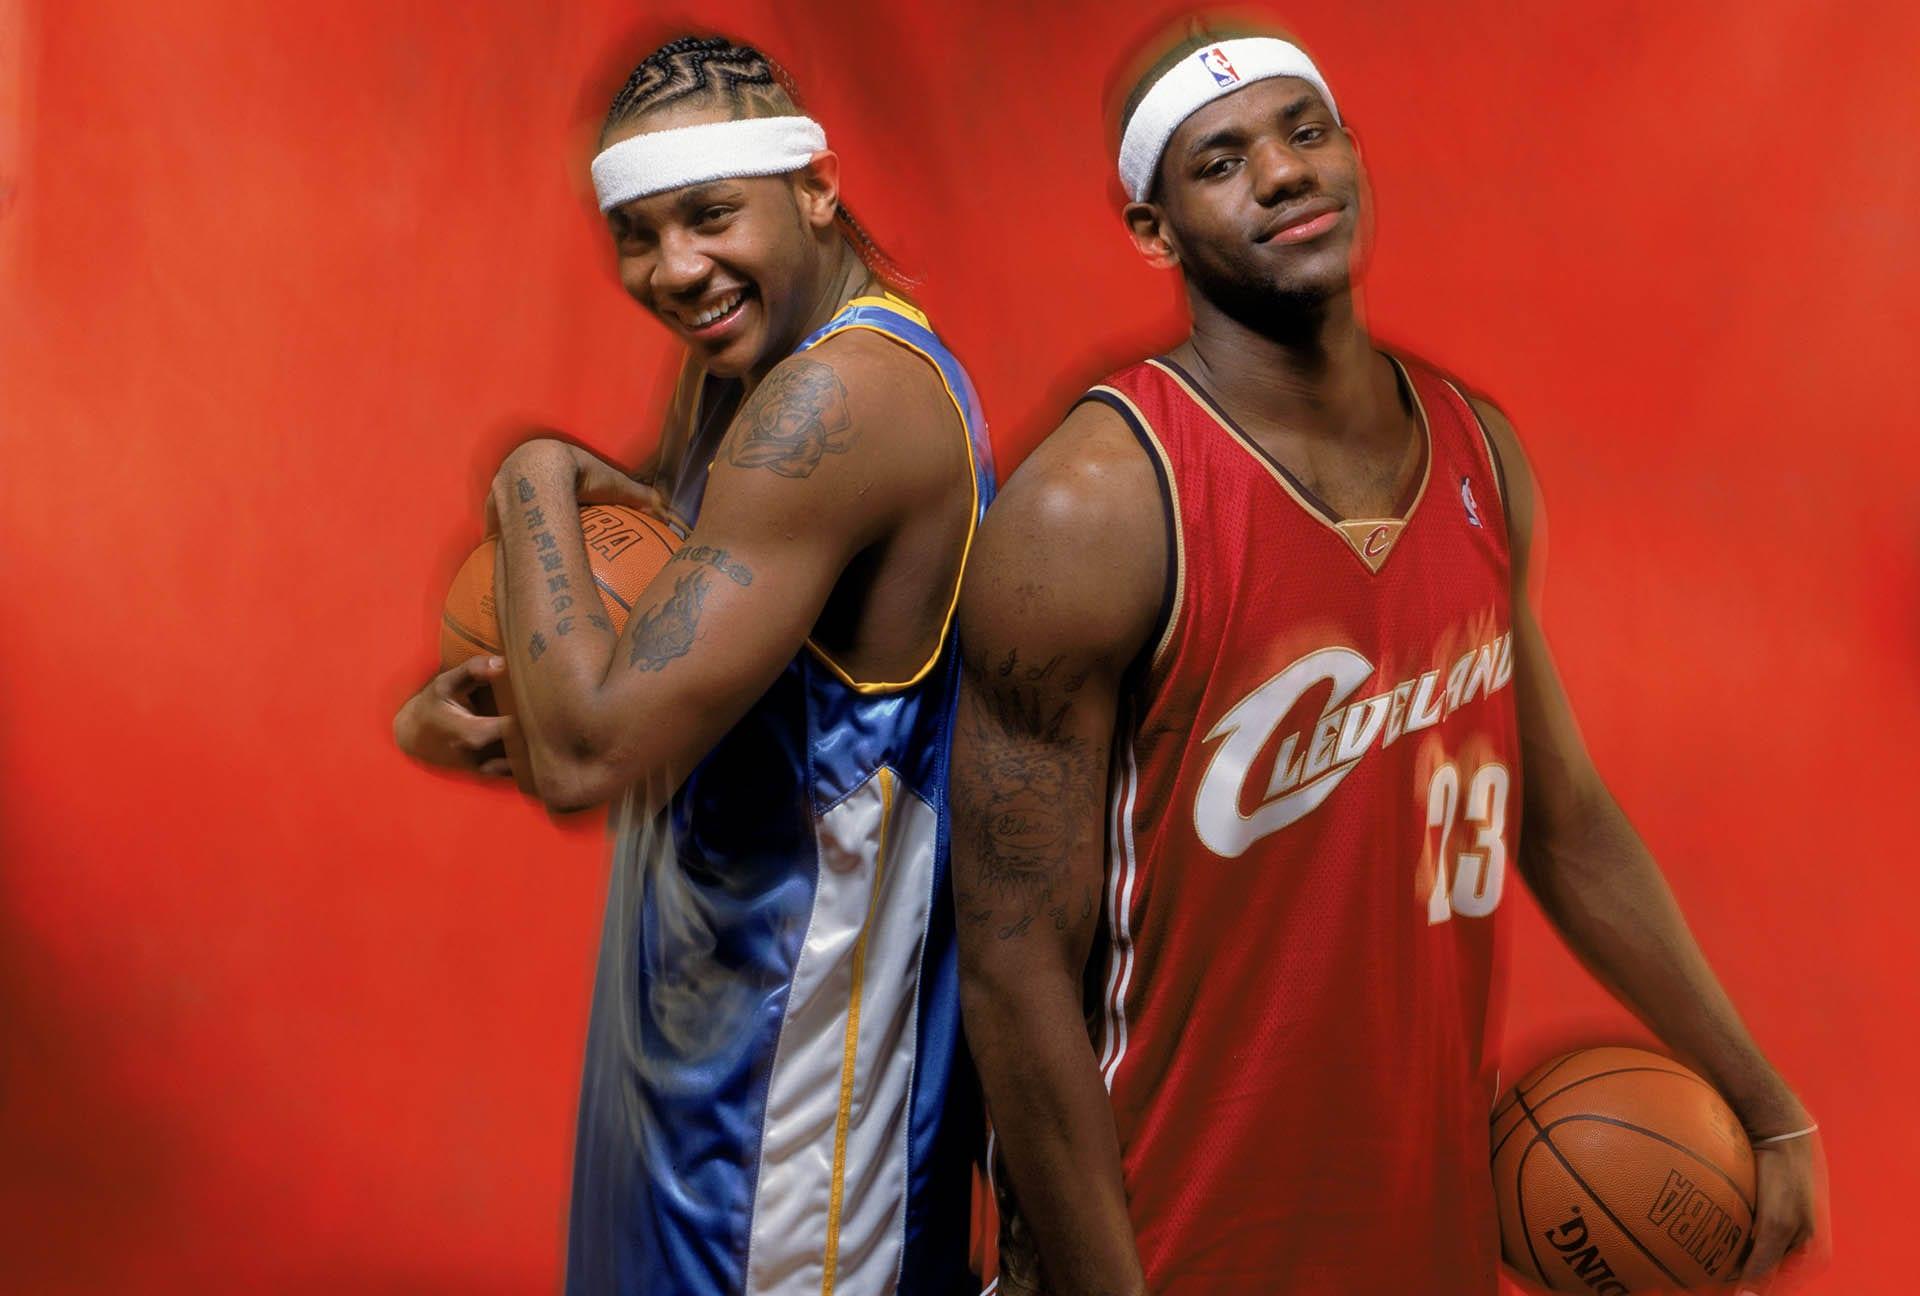 Photos: LeBron James & Carmelo Anthony through the years